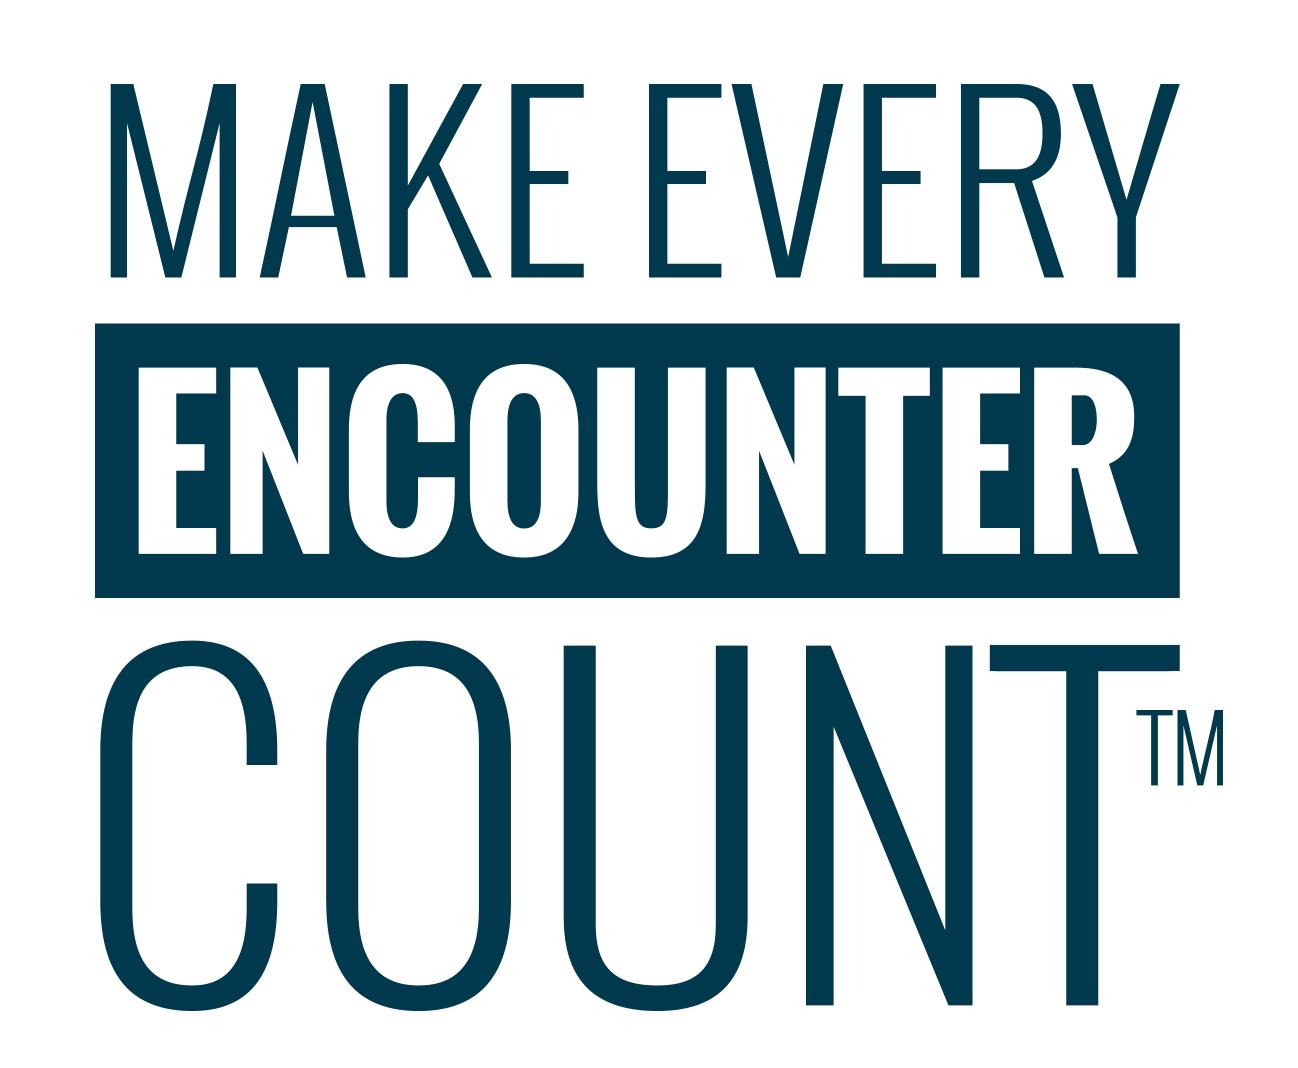 Enrollment: Make Every Encounter Count